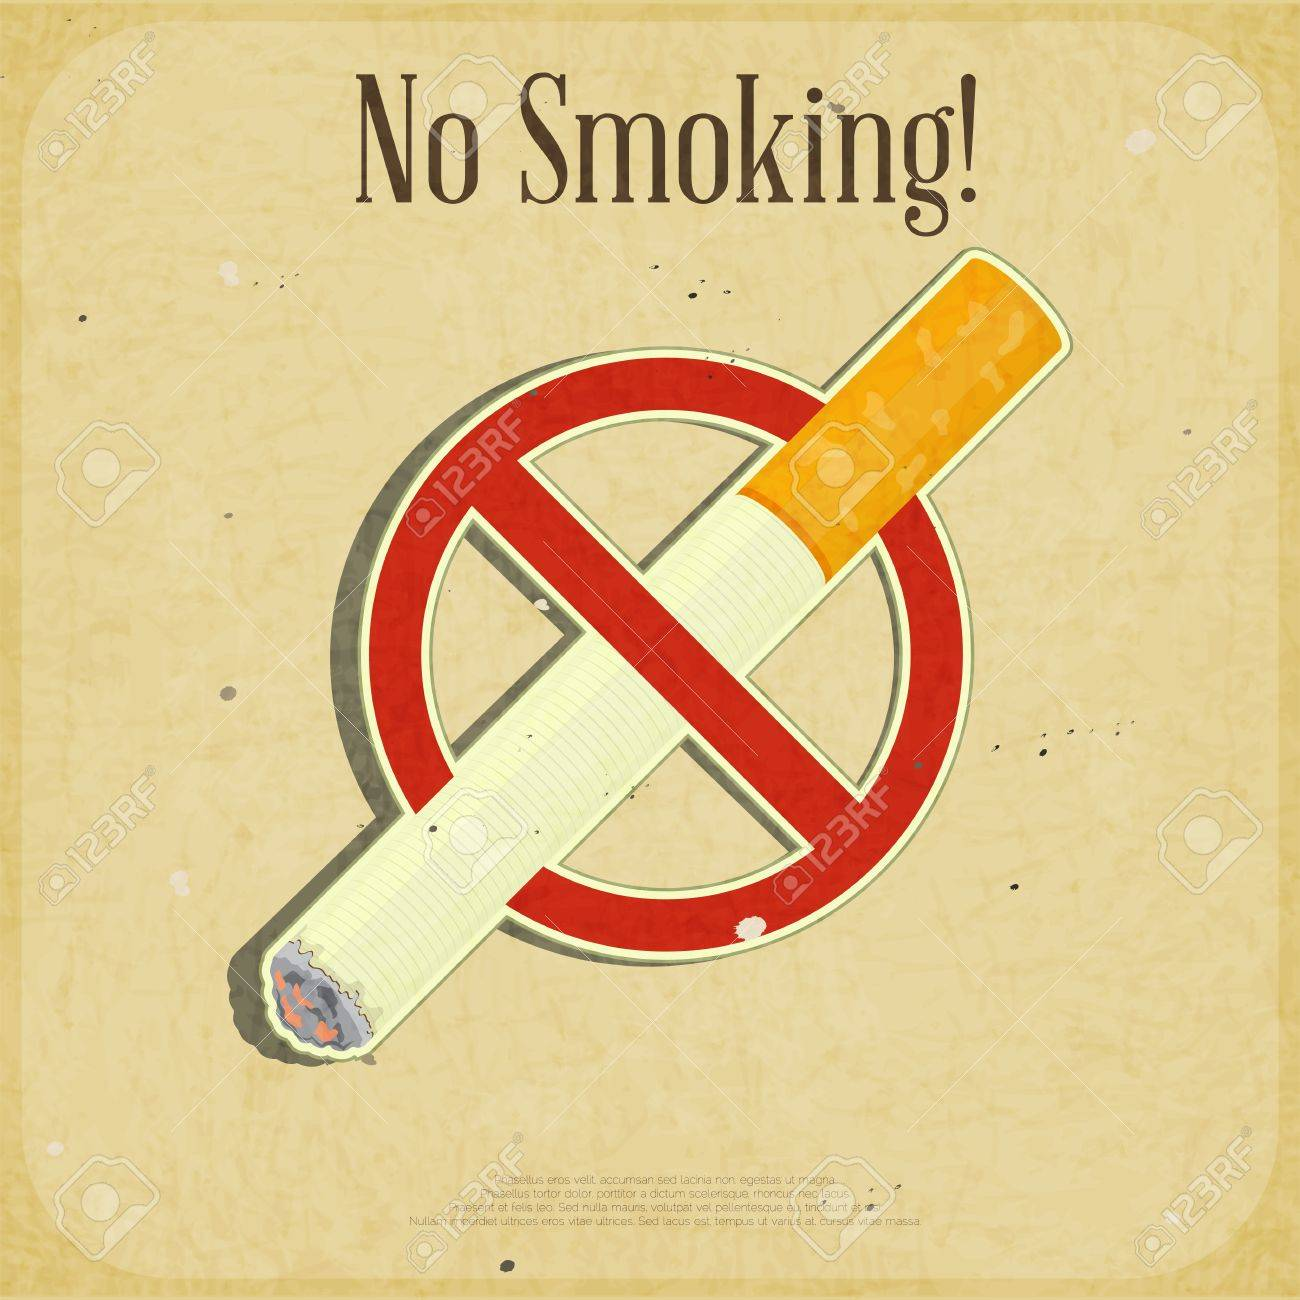 Retro poster - The Sign No Smoking - illustration Stock Vector - 15898290